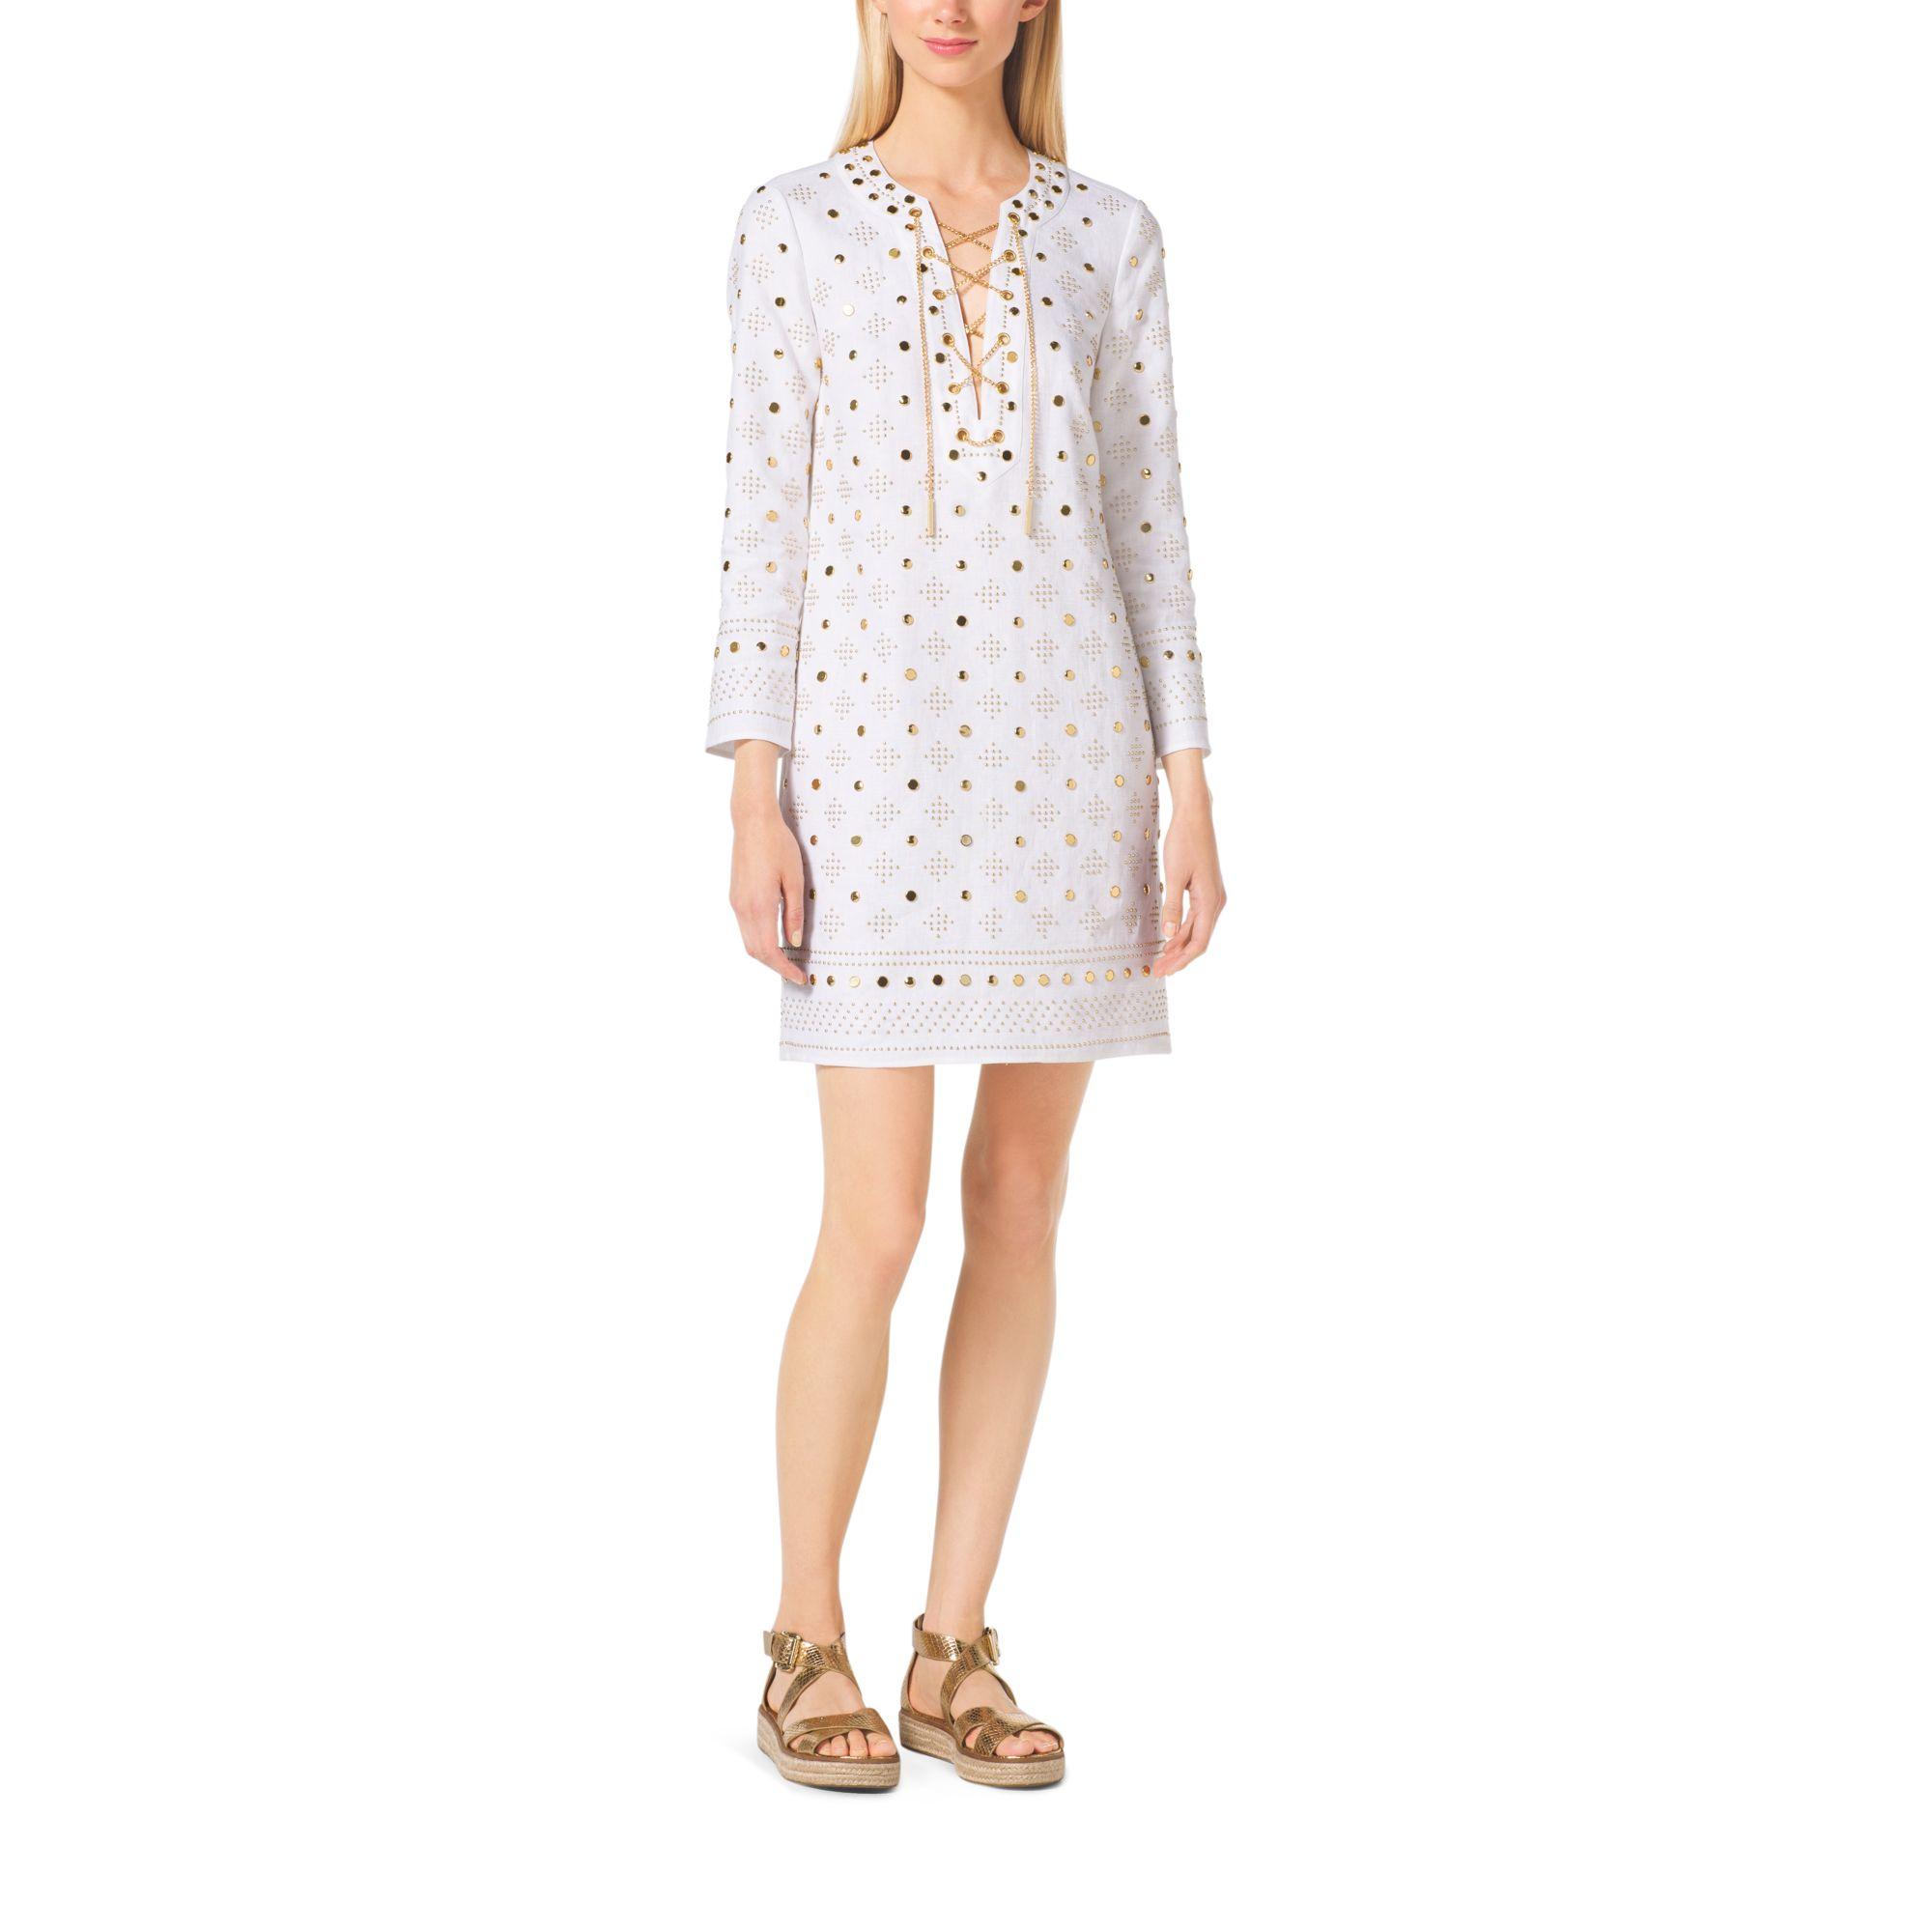 50e10e23964 Michael Kors Embroidered Linen Tunic in White - Lyst